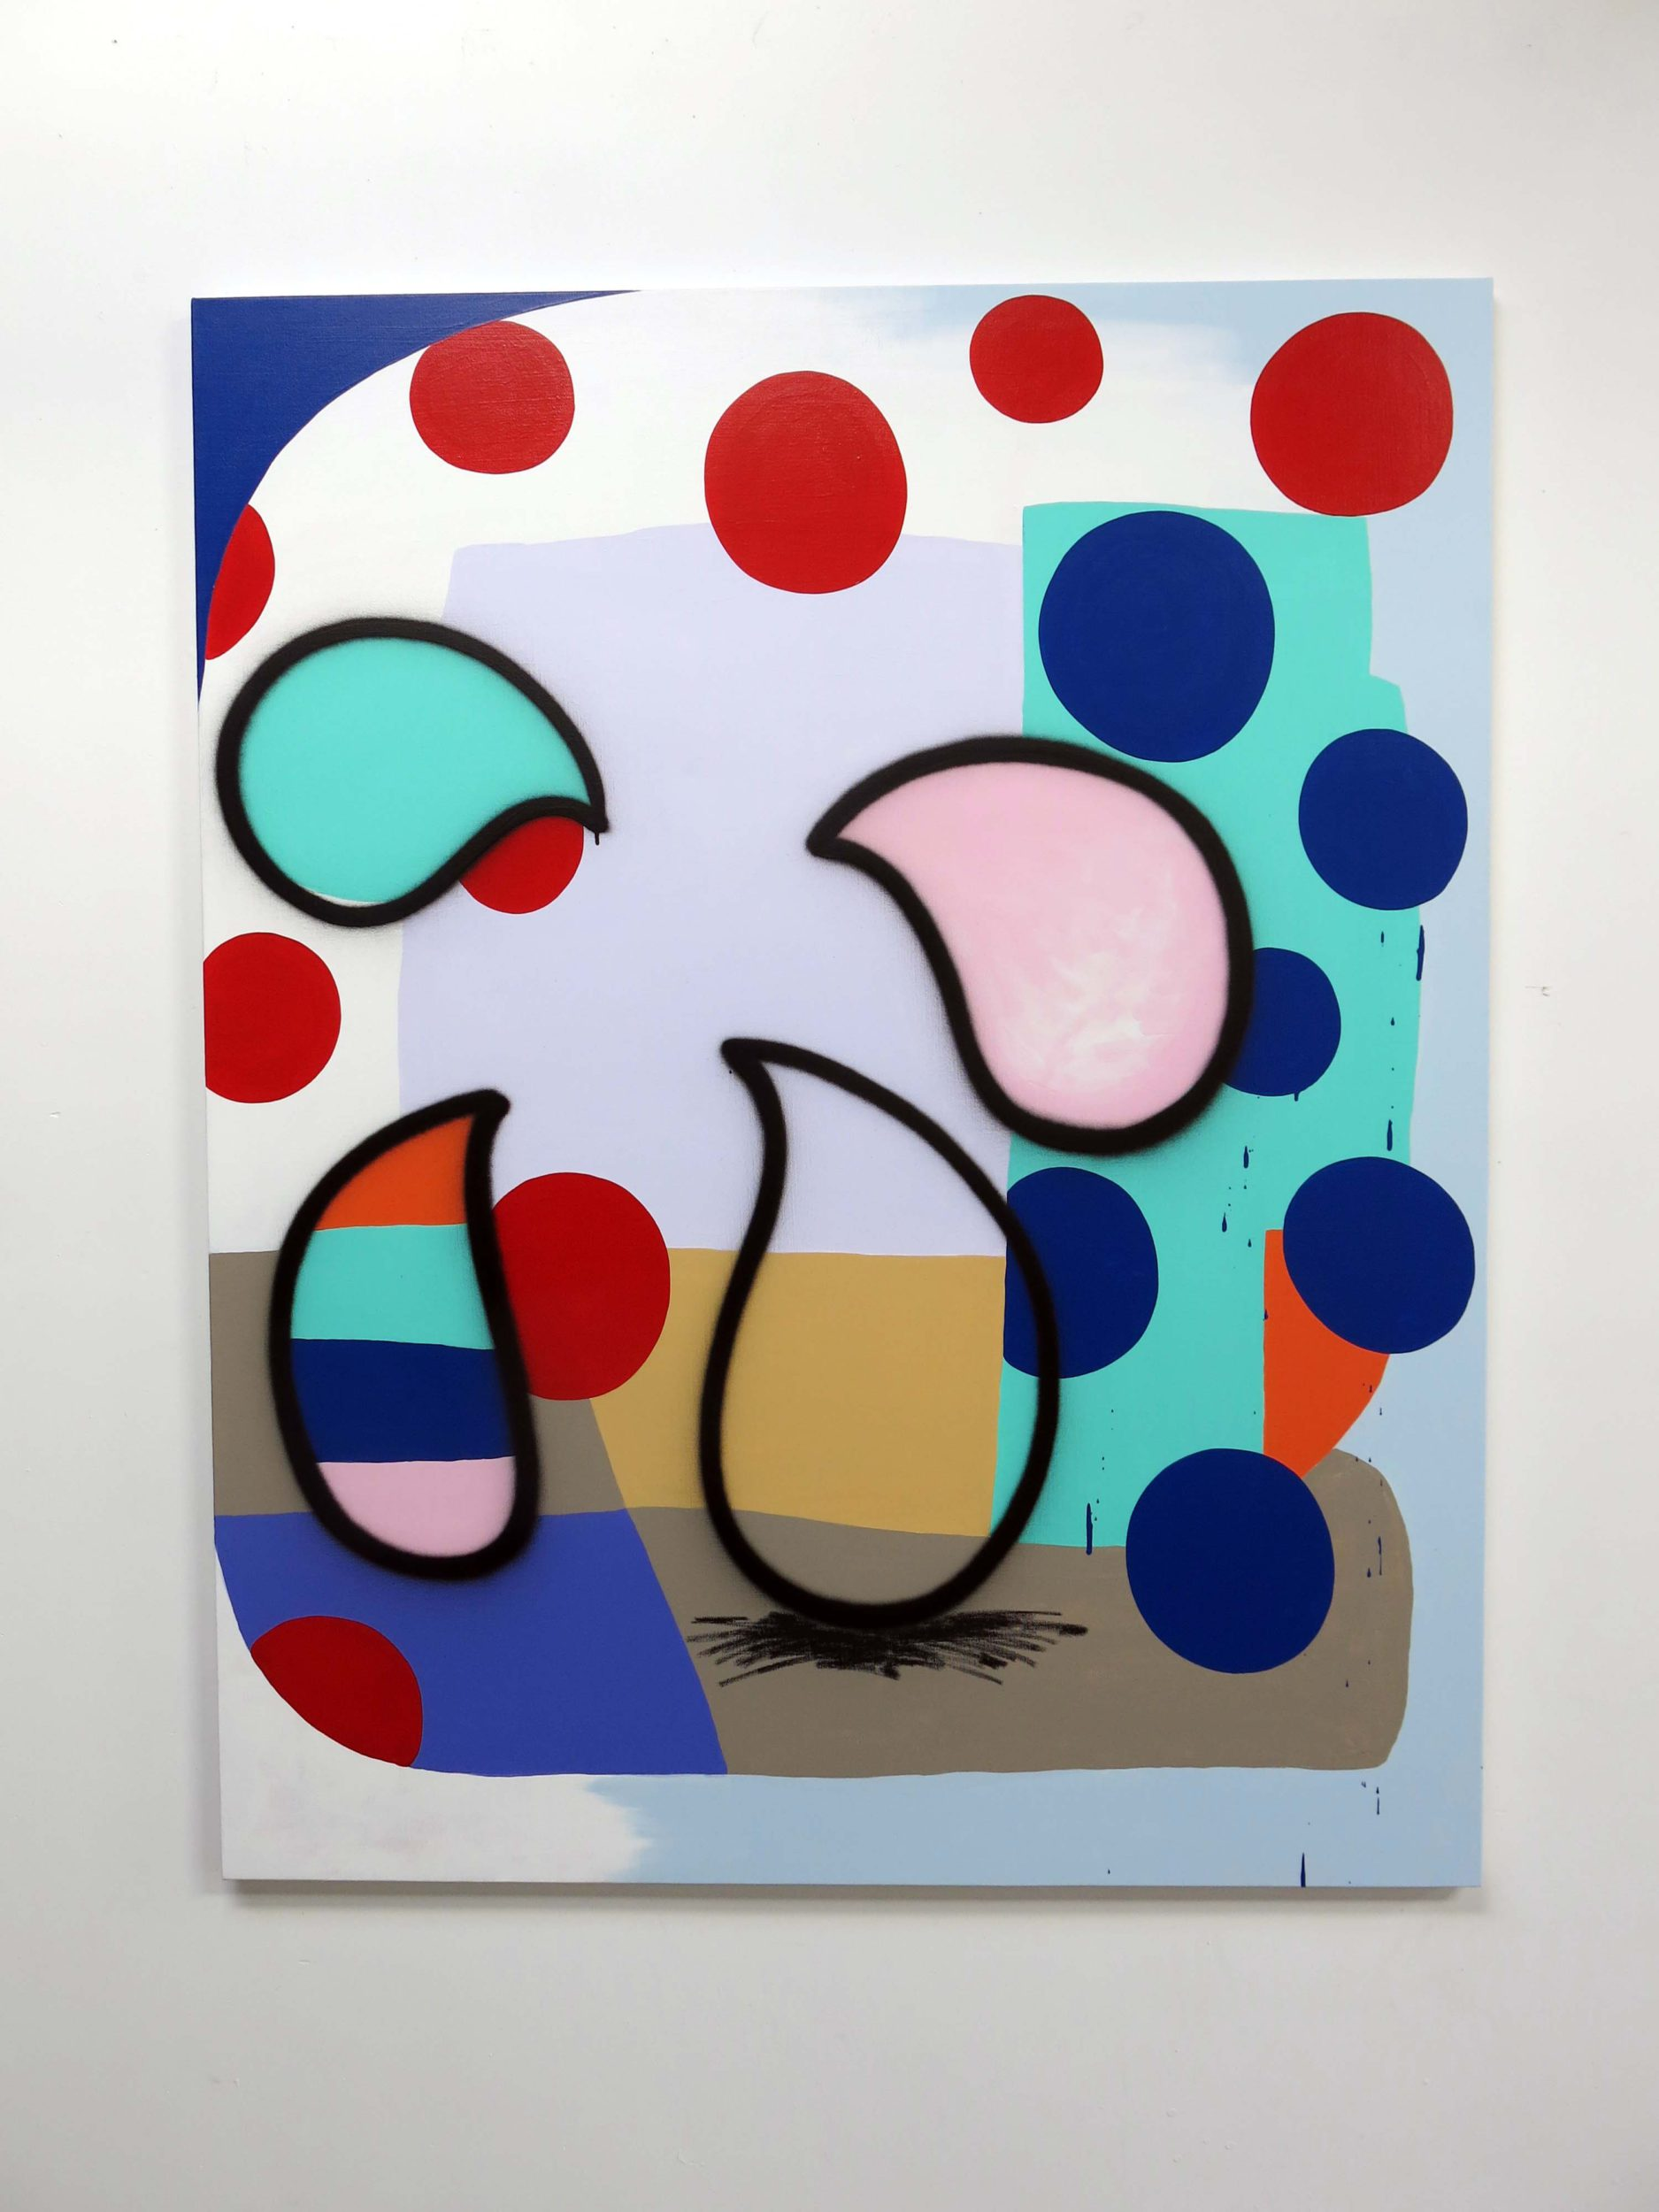 Bruce, Untitled 3, 2018, Acrylics and spray paint on canvas, 130 x 160cm